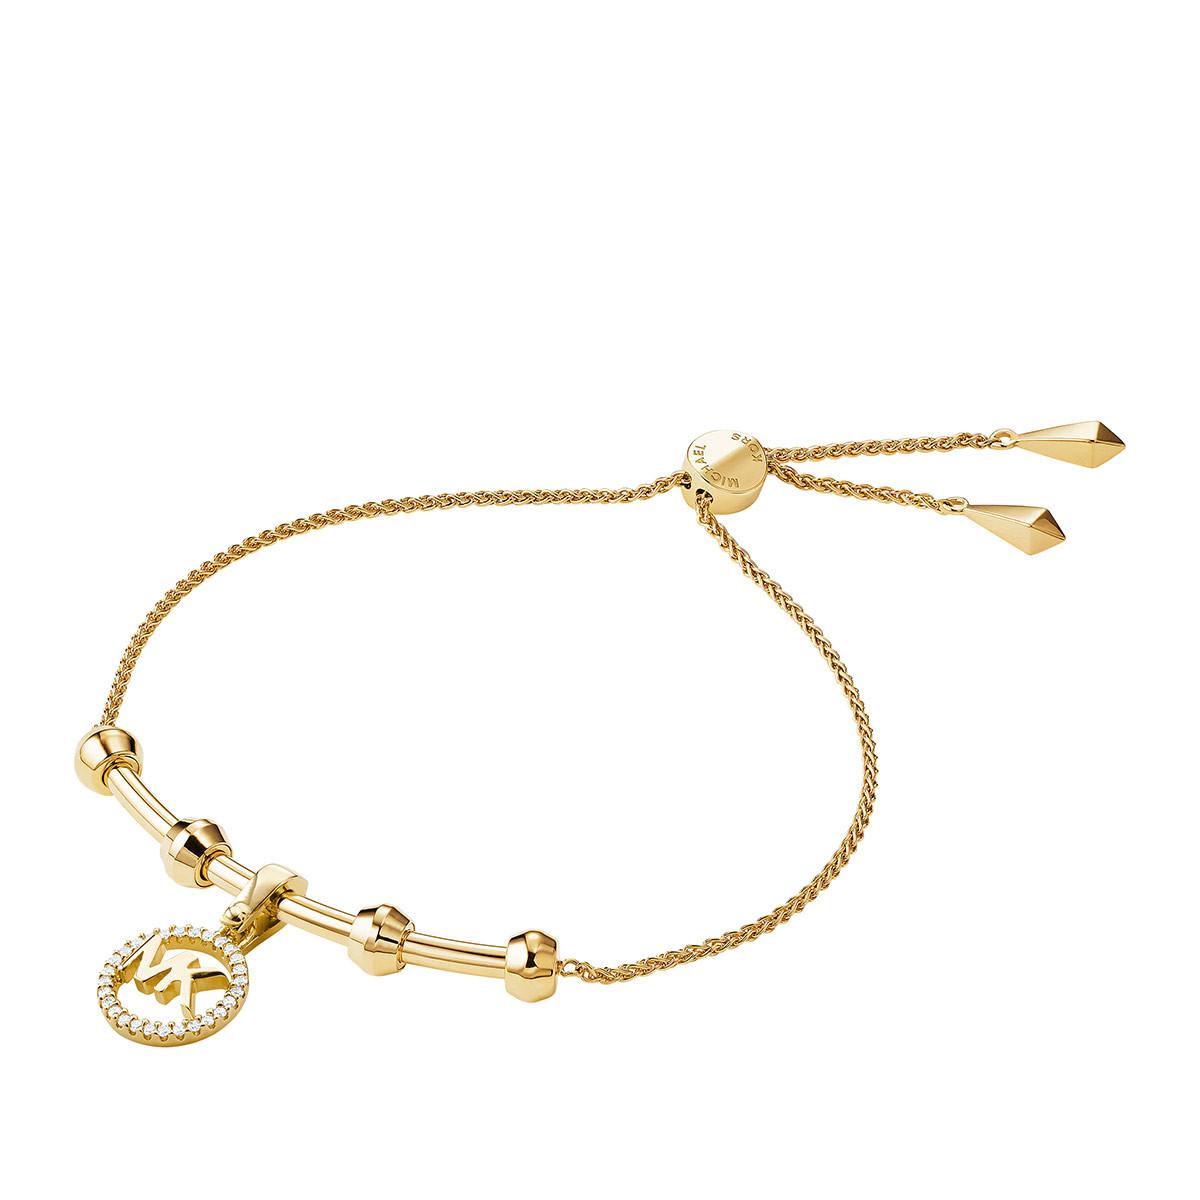 Michael Kors Armband - MKC1107AN710 Logo Charm Slider Gold - in gold - für Damen